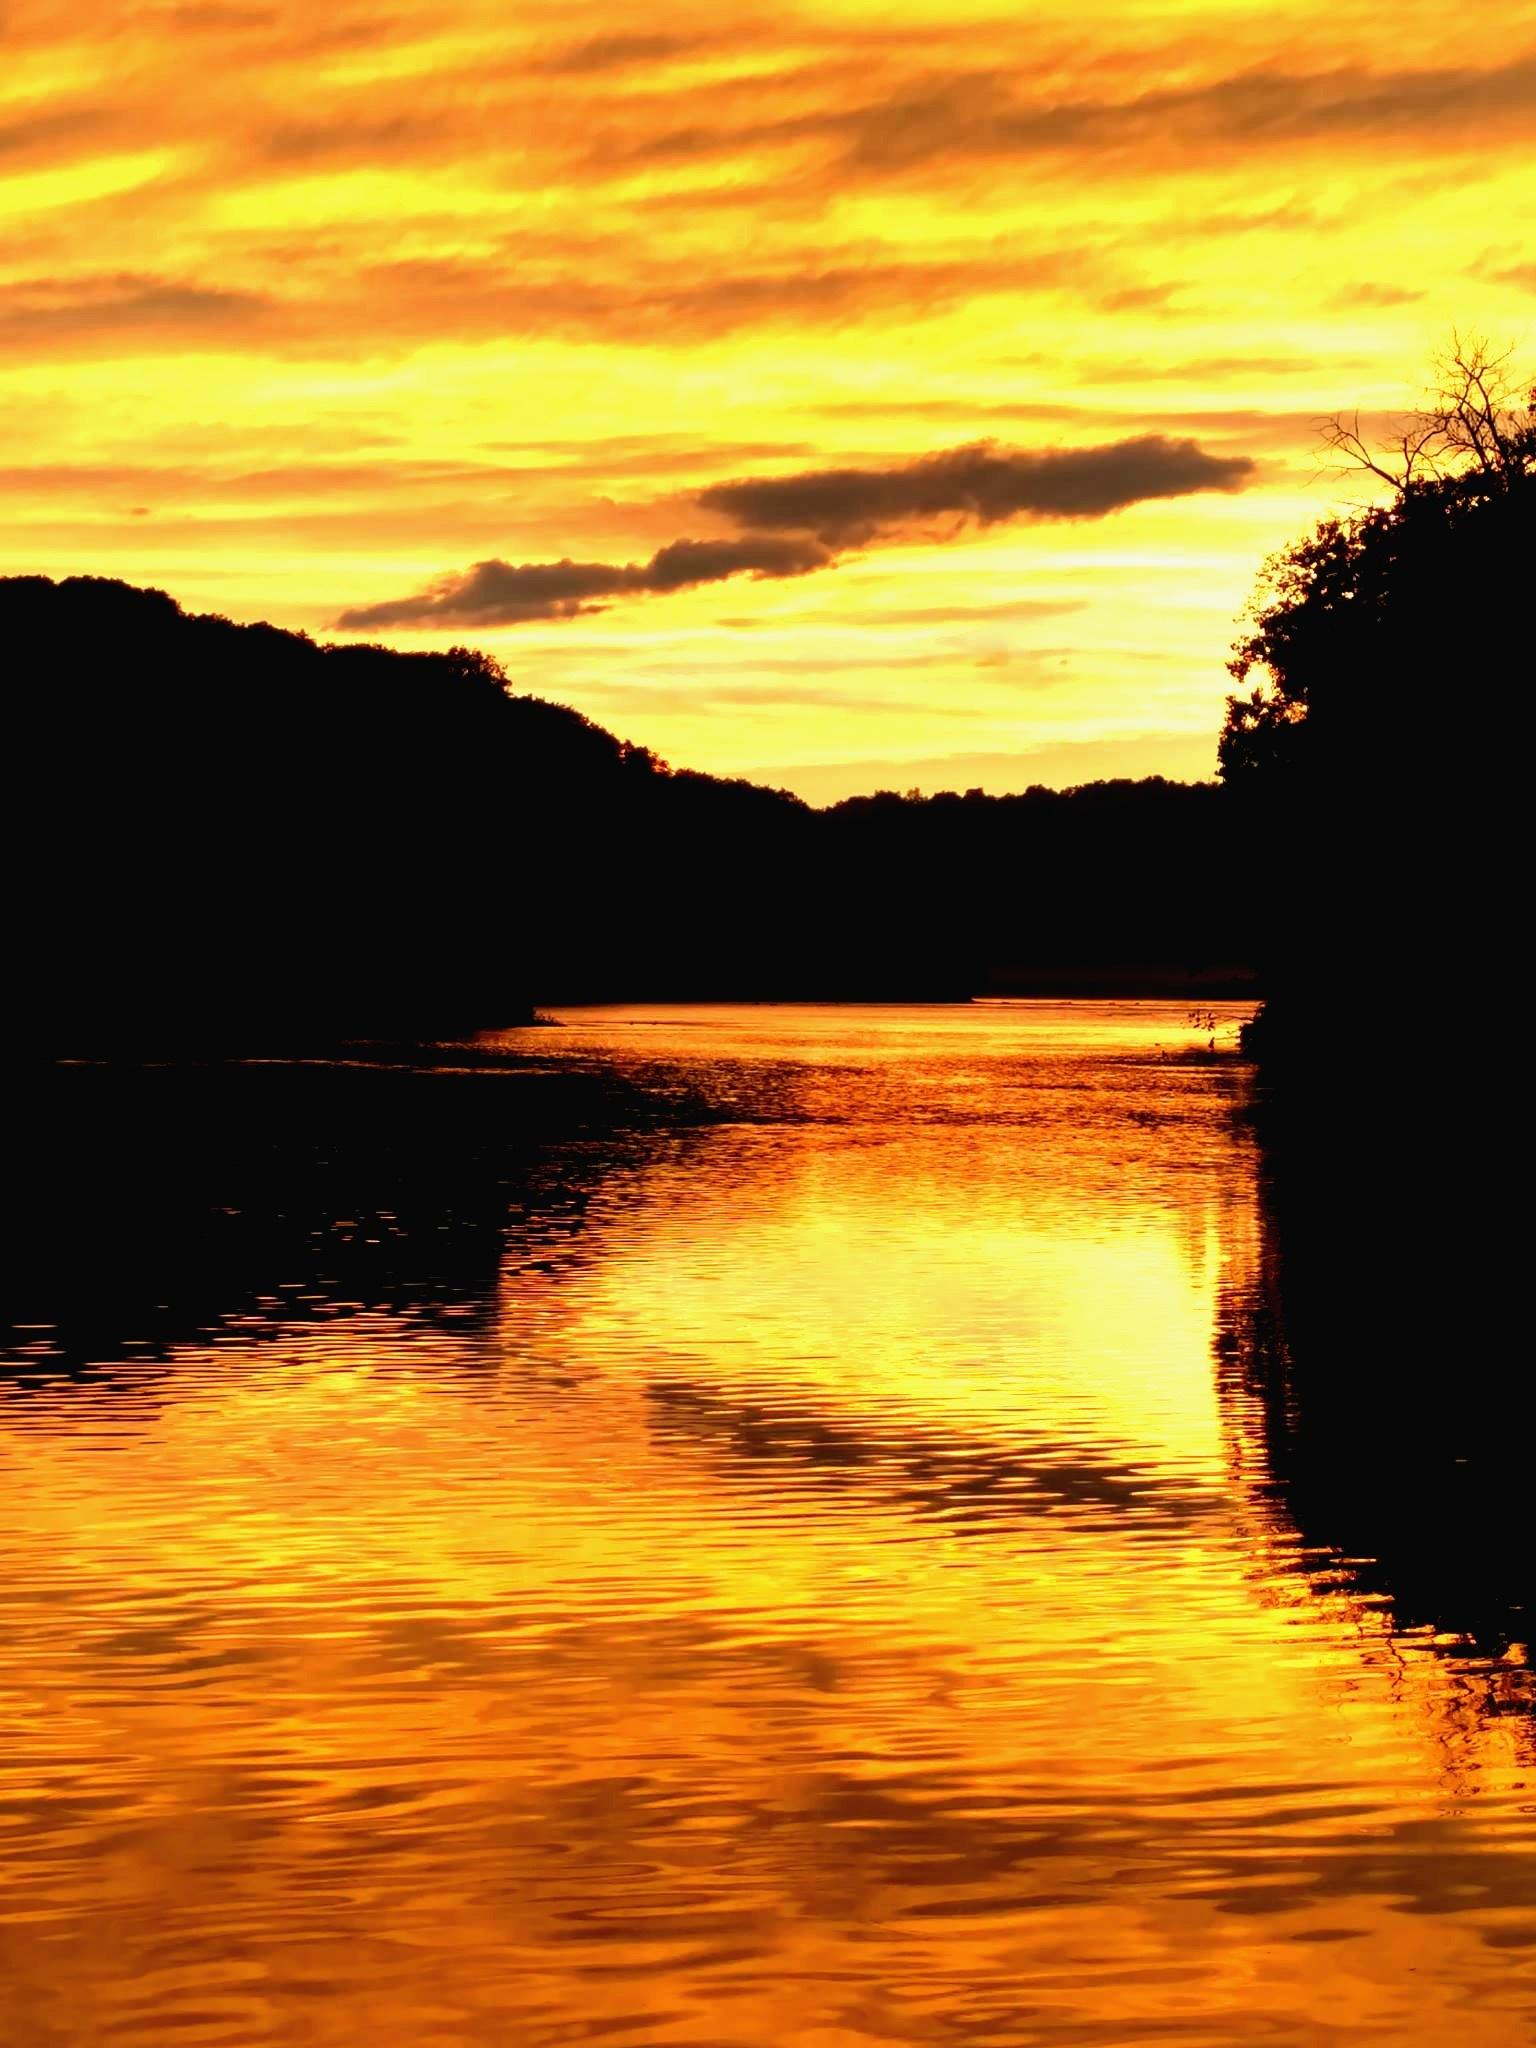 Sunset in Ft Edward by ccbarron1